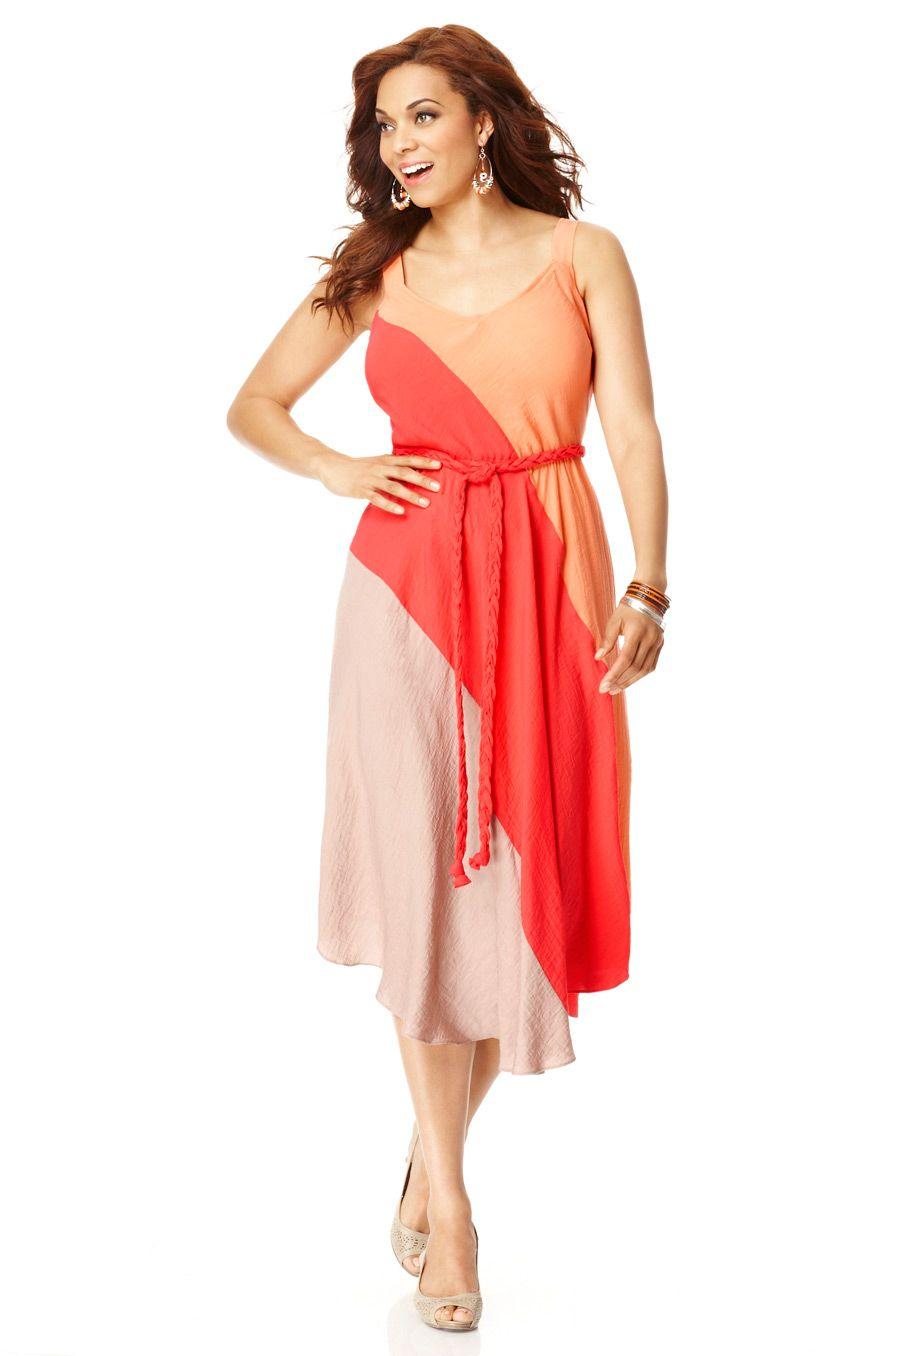 Plus Size Belted Colorblock Dress Plus Size Avenue Clearance